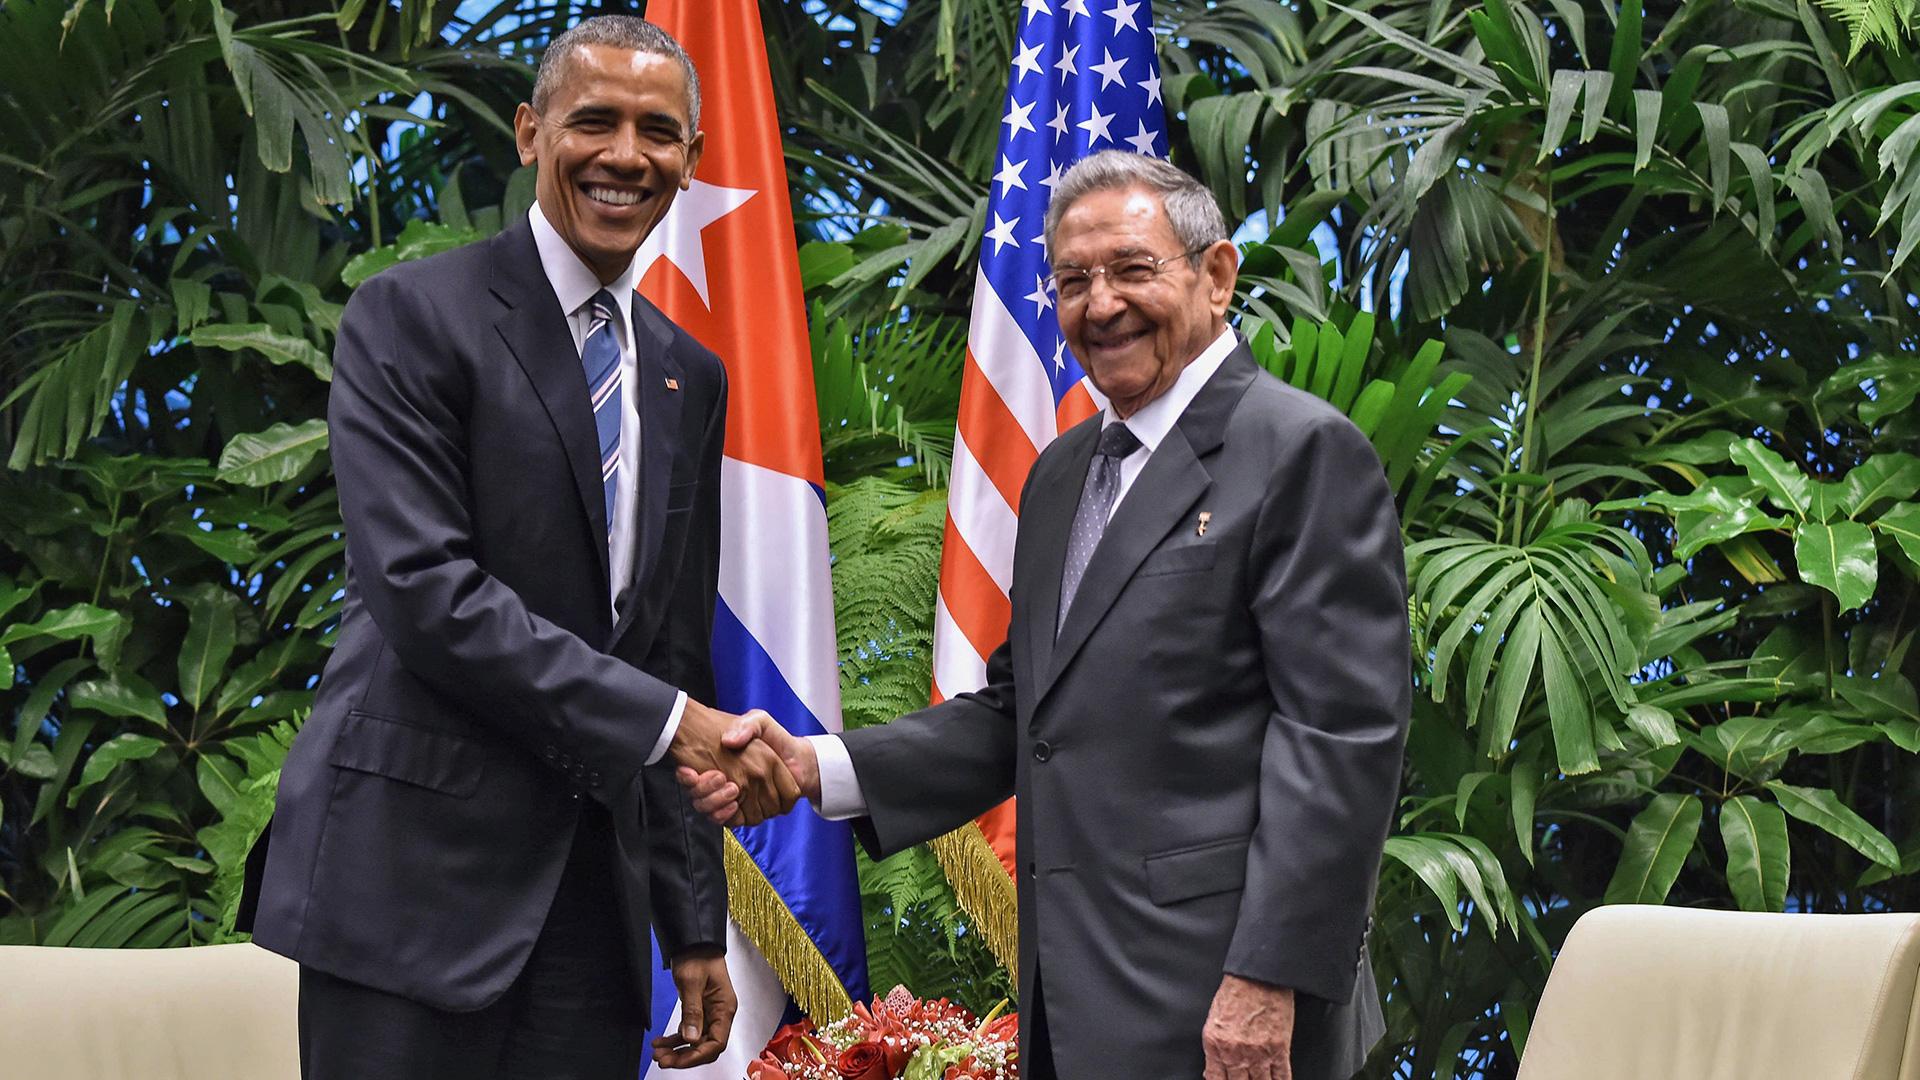 1-Obama-Castro-032216-GETTY-FTR.jpg